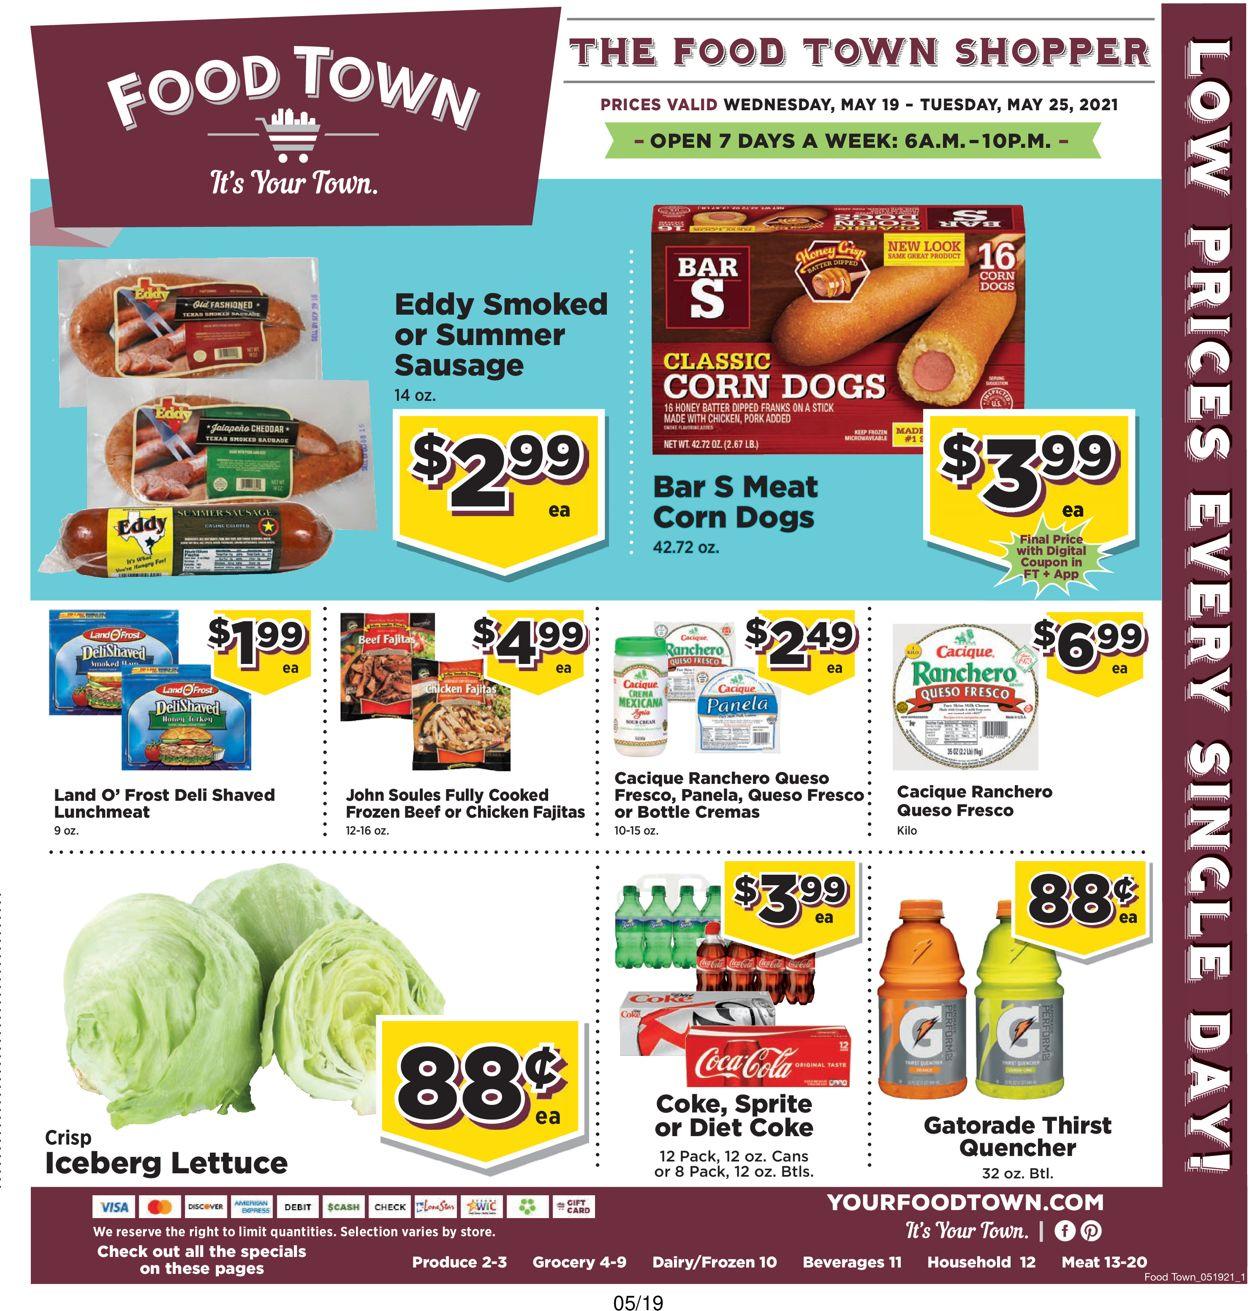 Food Town Weekly Ad Circular - valid 05/19-05/25/2021